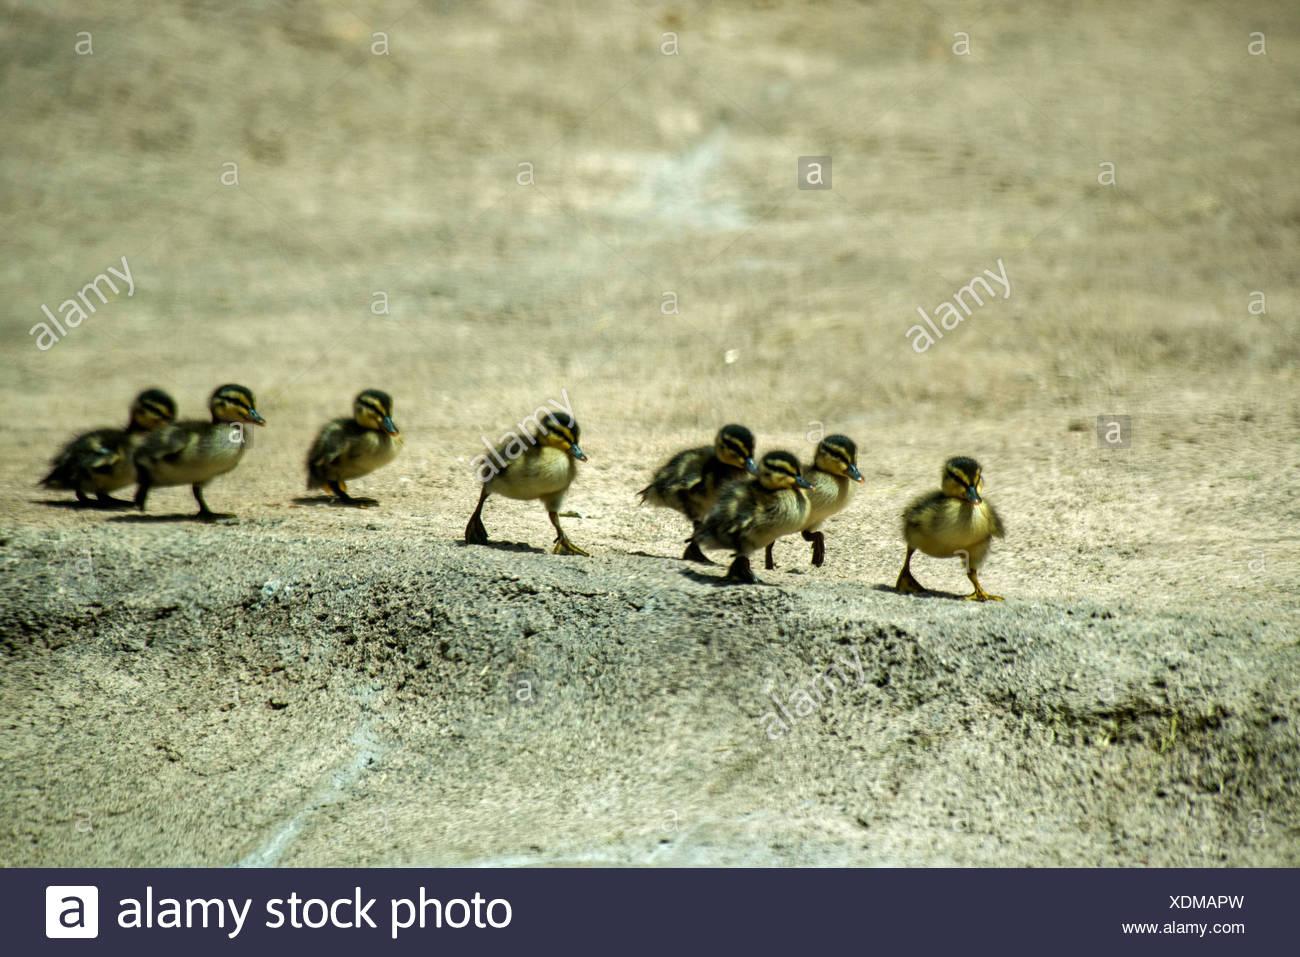 mallard ducklings, duck, animals, birds - Stock Image